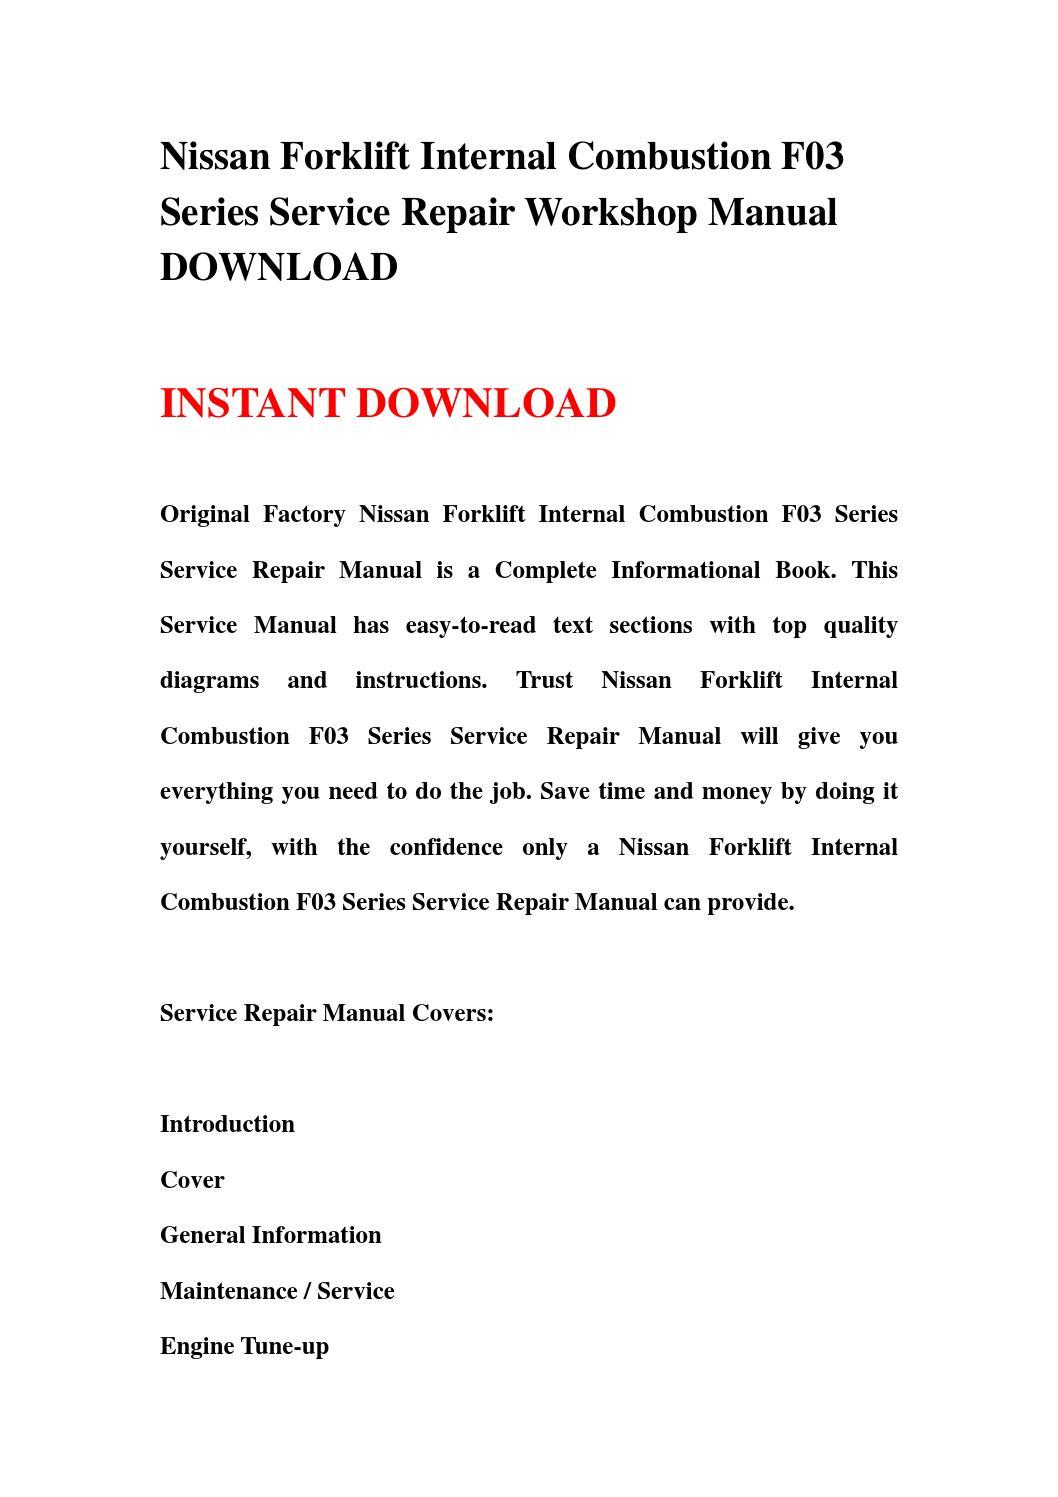 nissan forklift internal combustion f03 series service